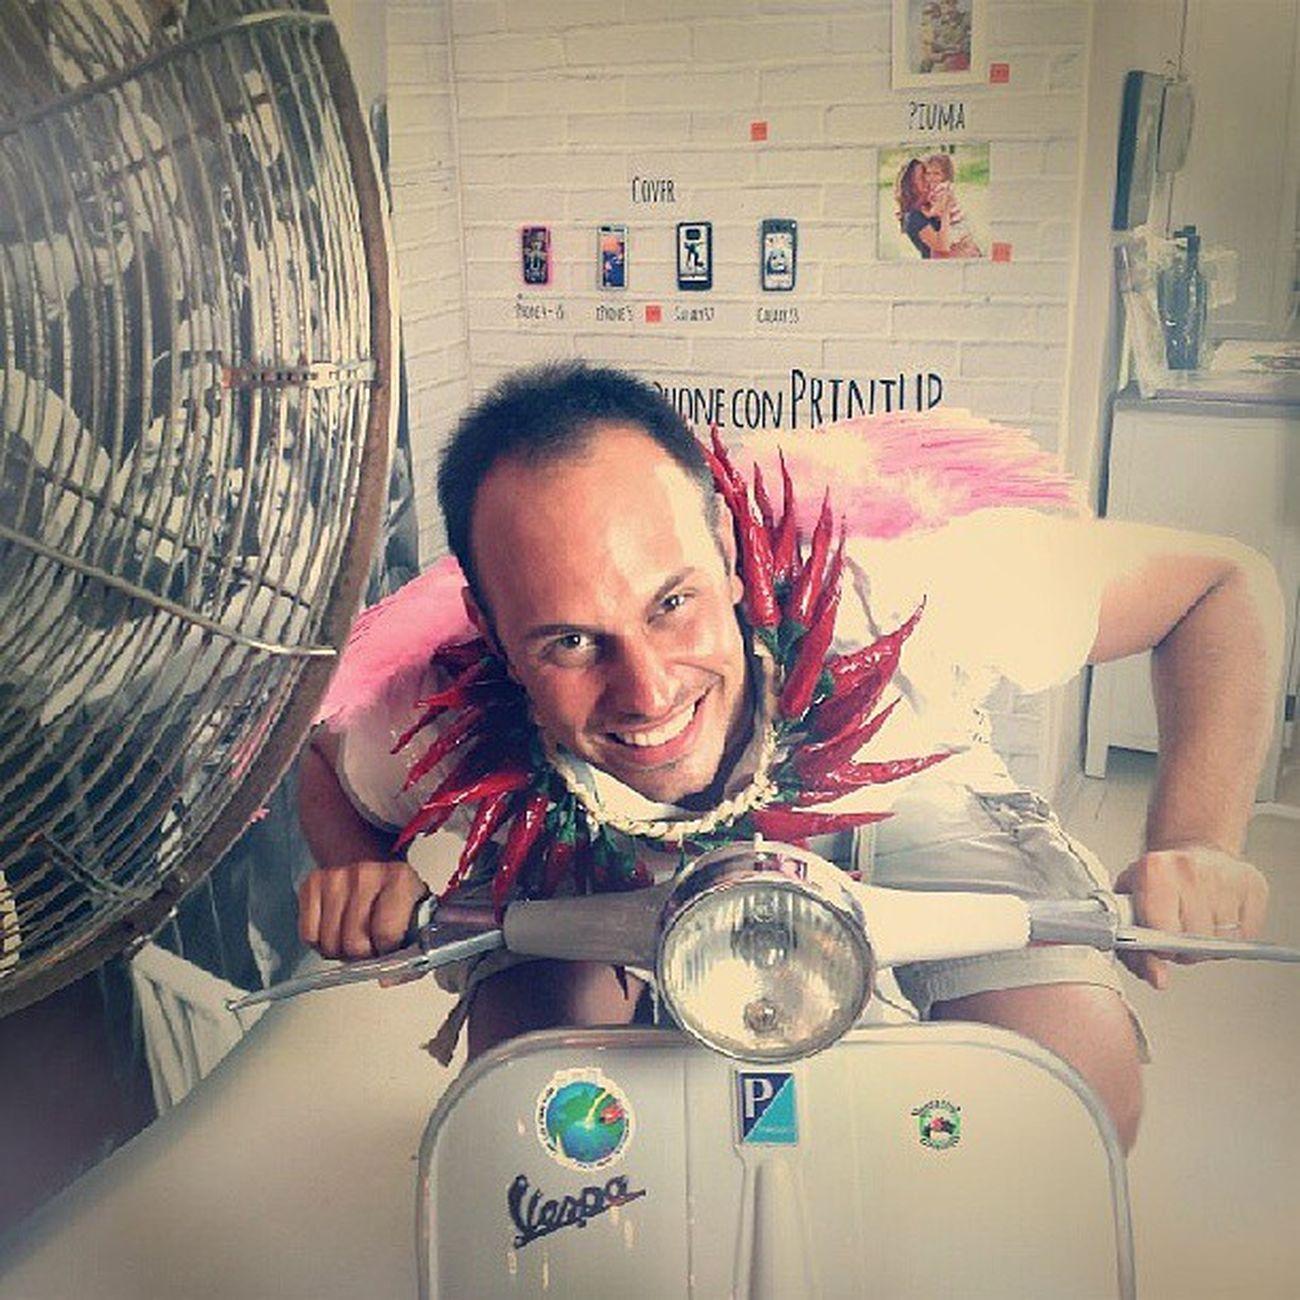 #piccante #photosicafe #photosi #printup #paparazzi #riccione #redcarpet #makkaroni Paparazzi Vespa Riccione Redcarpet Piccante Printup Photosi Photosicafe Makkaroni